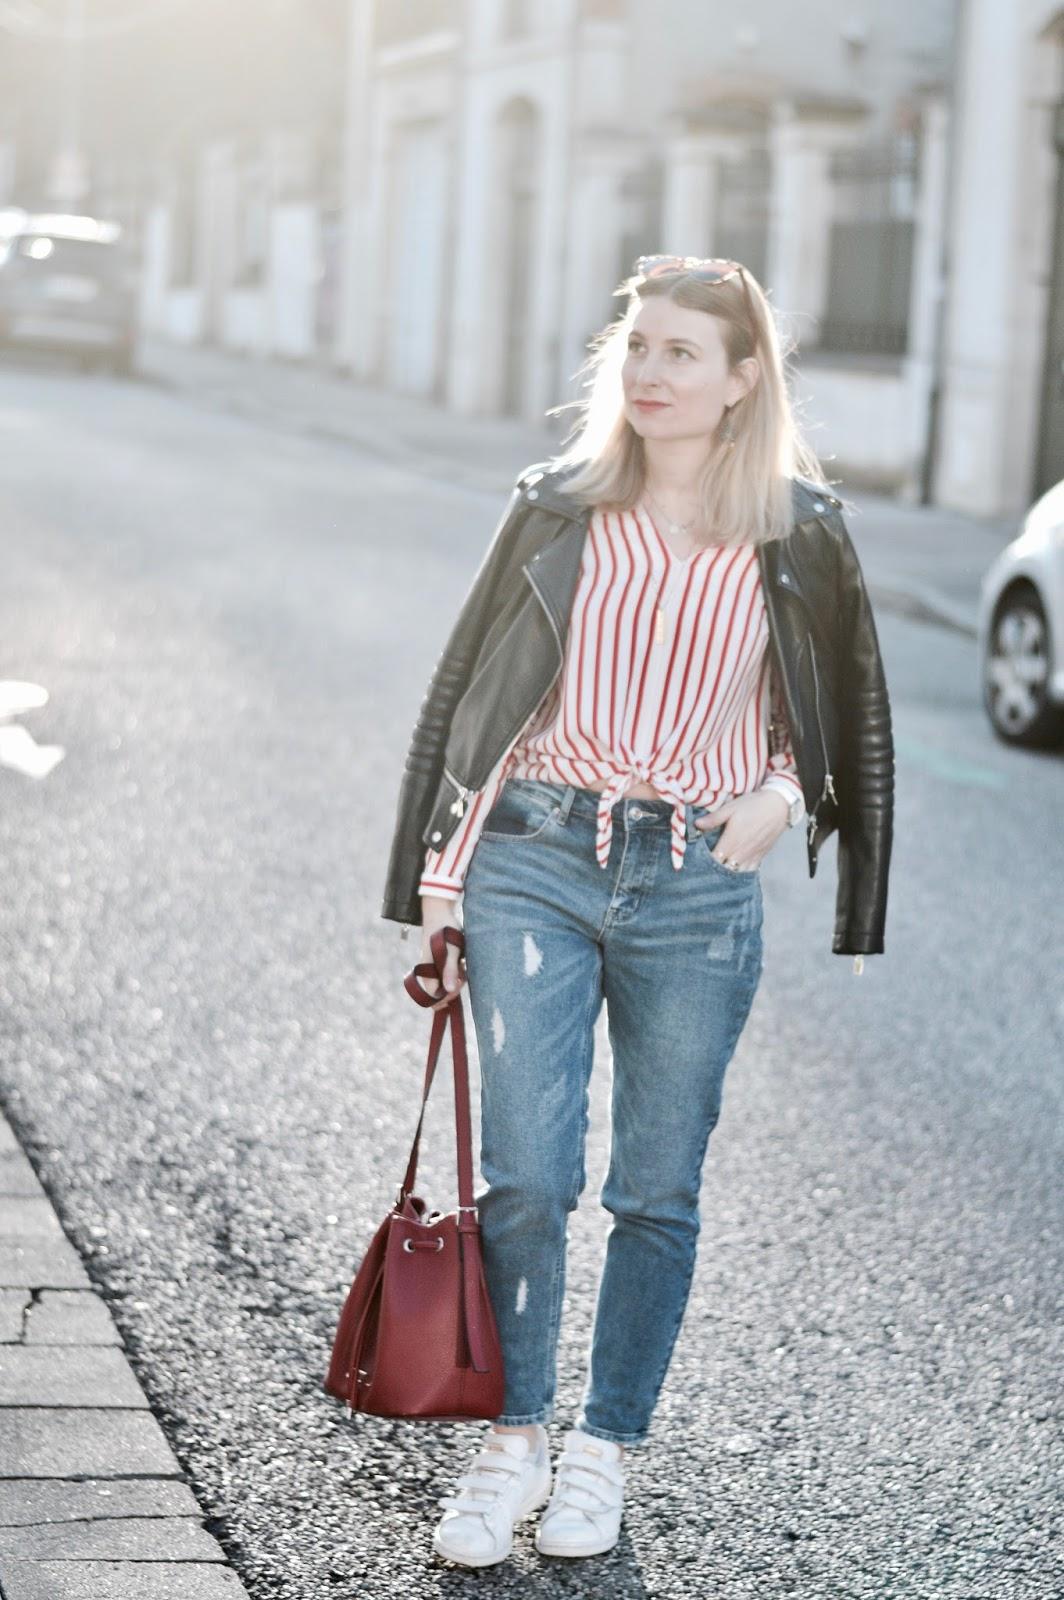 look femme : chemise rayée rouge et jean boyfriend